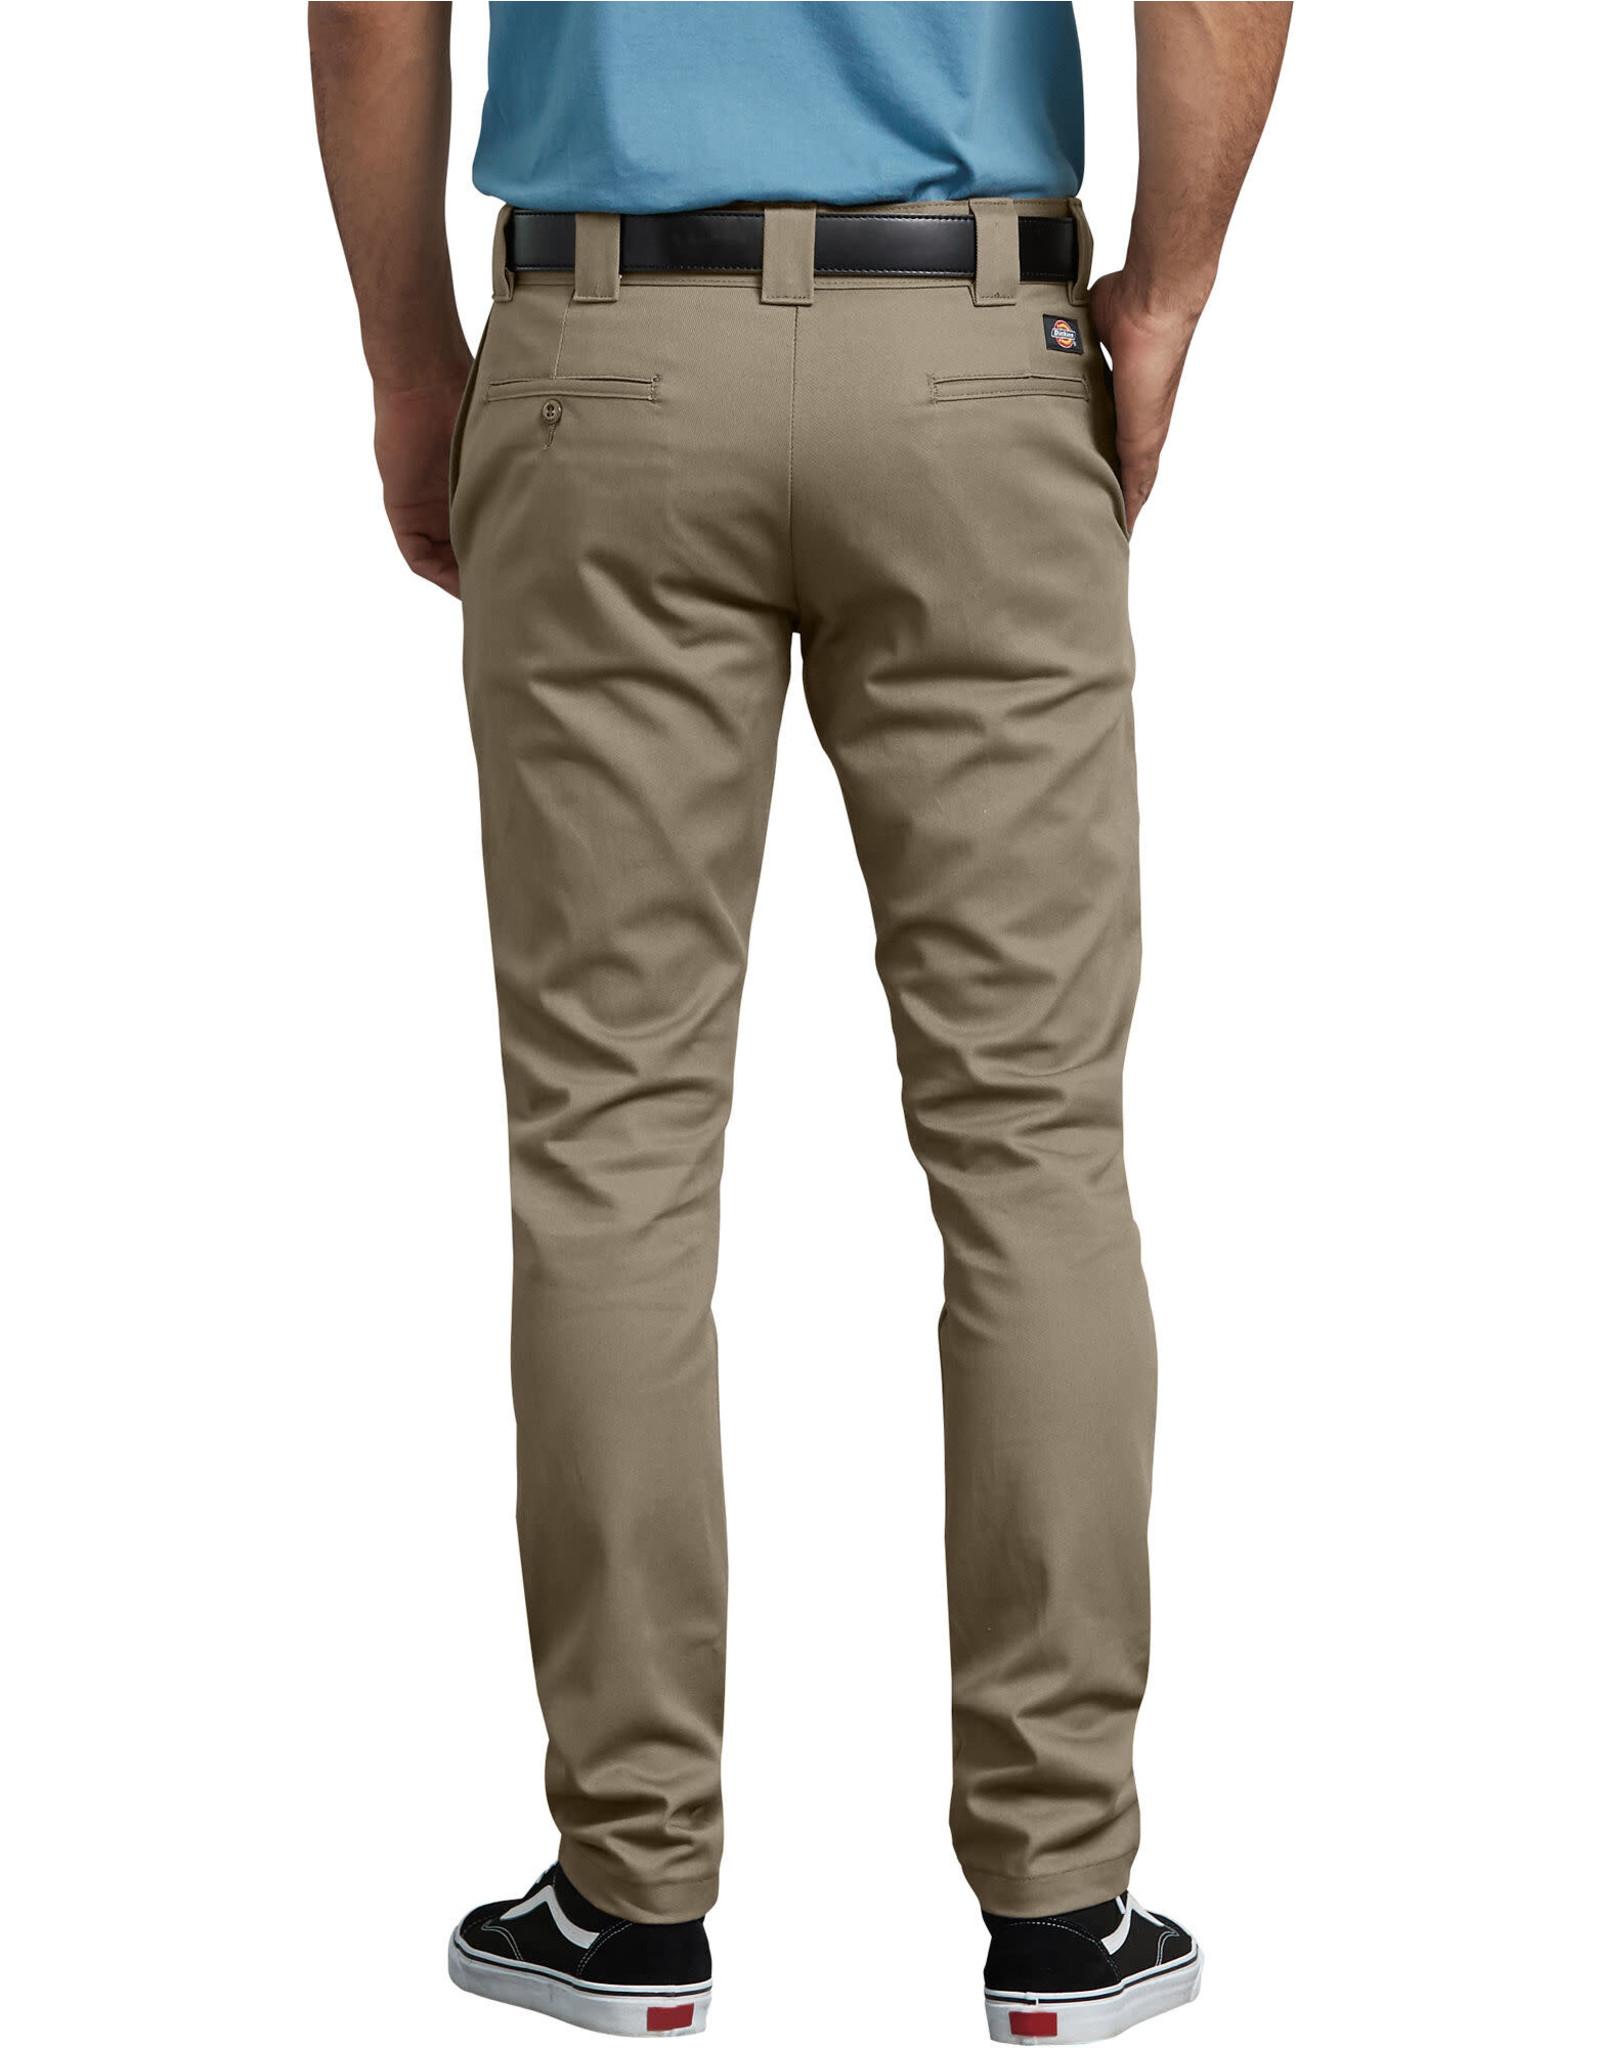 DICKIES FLEX Slim Skinny Fit Twill Work Pants